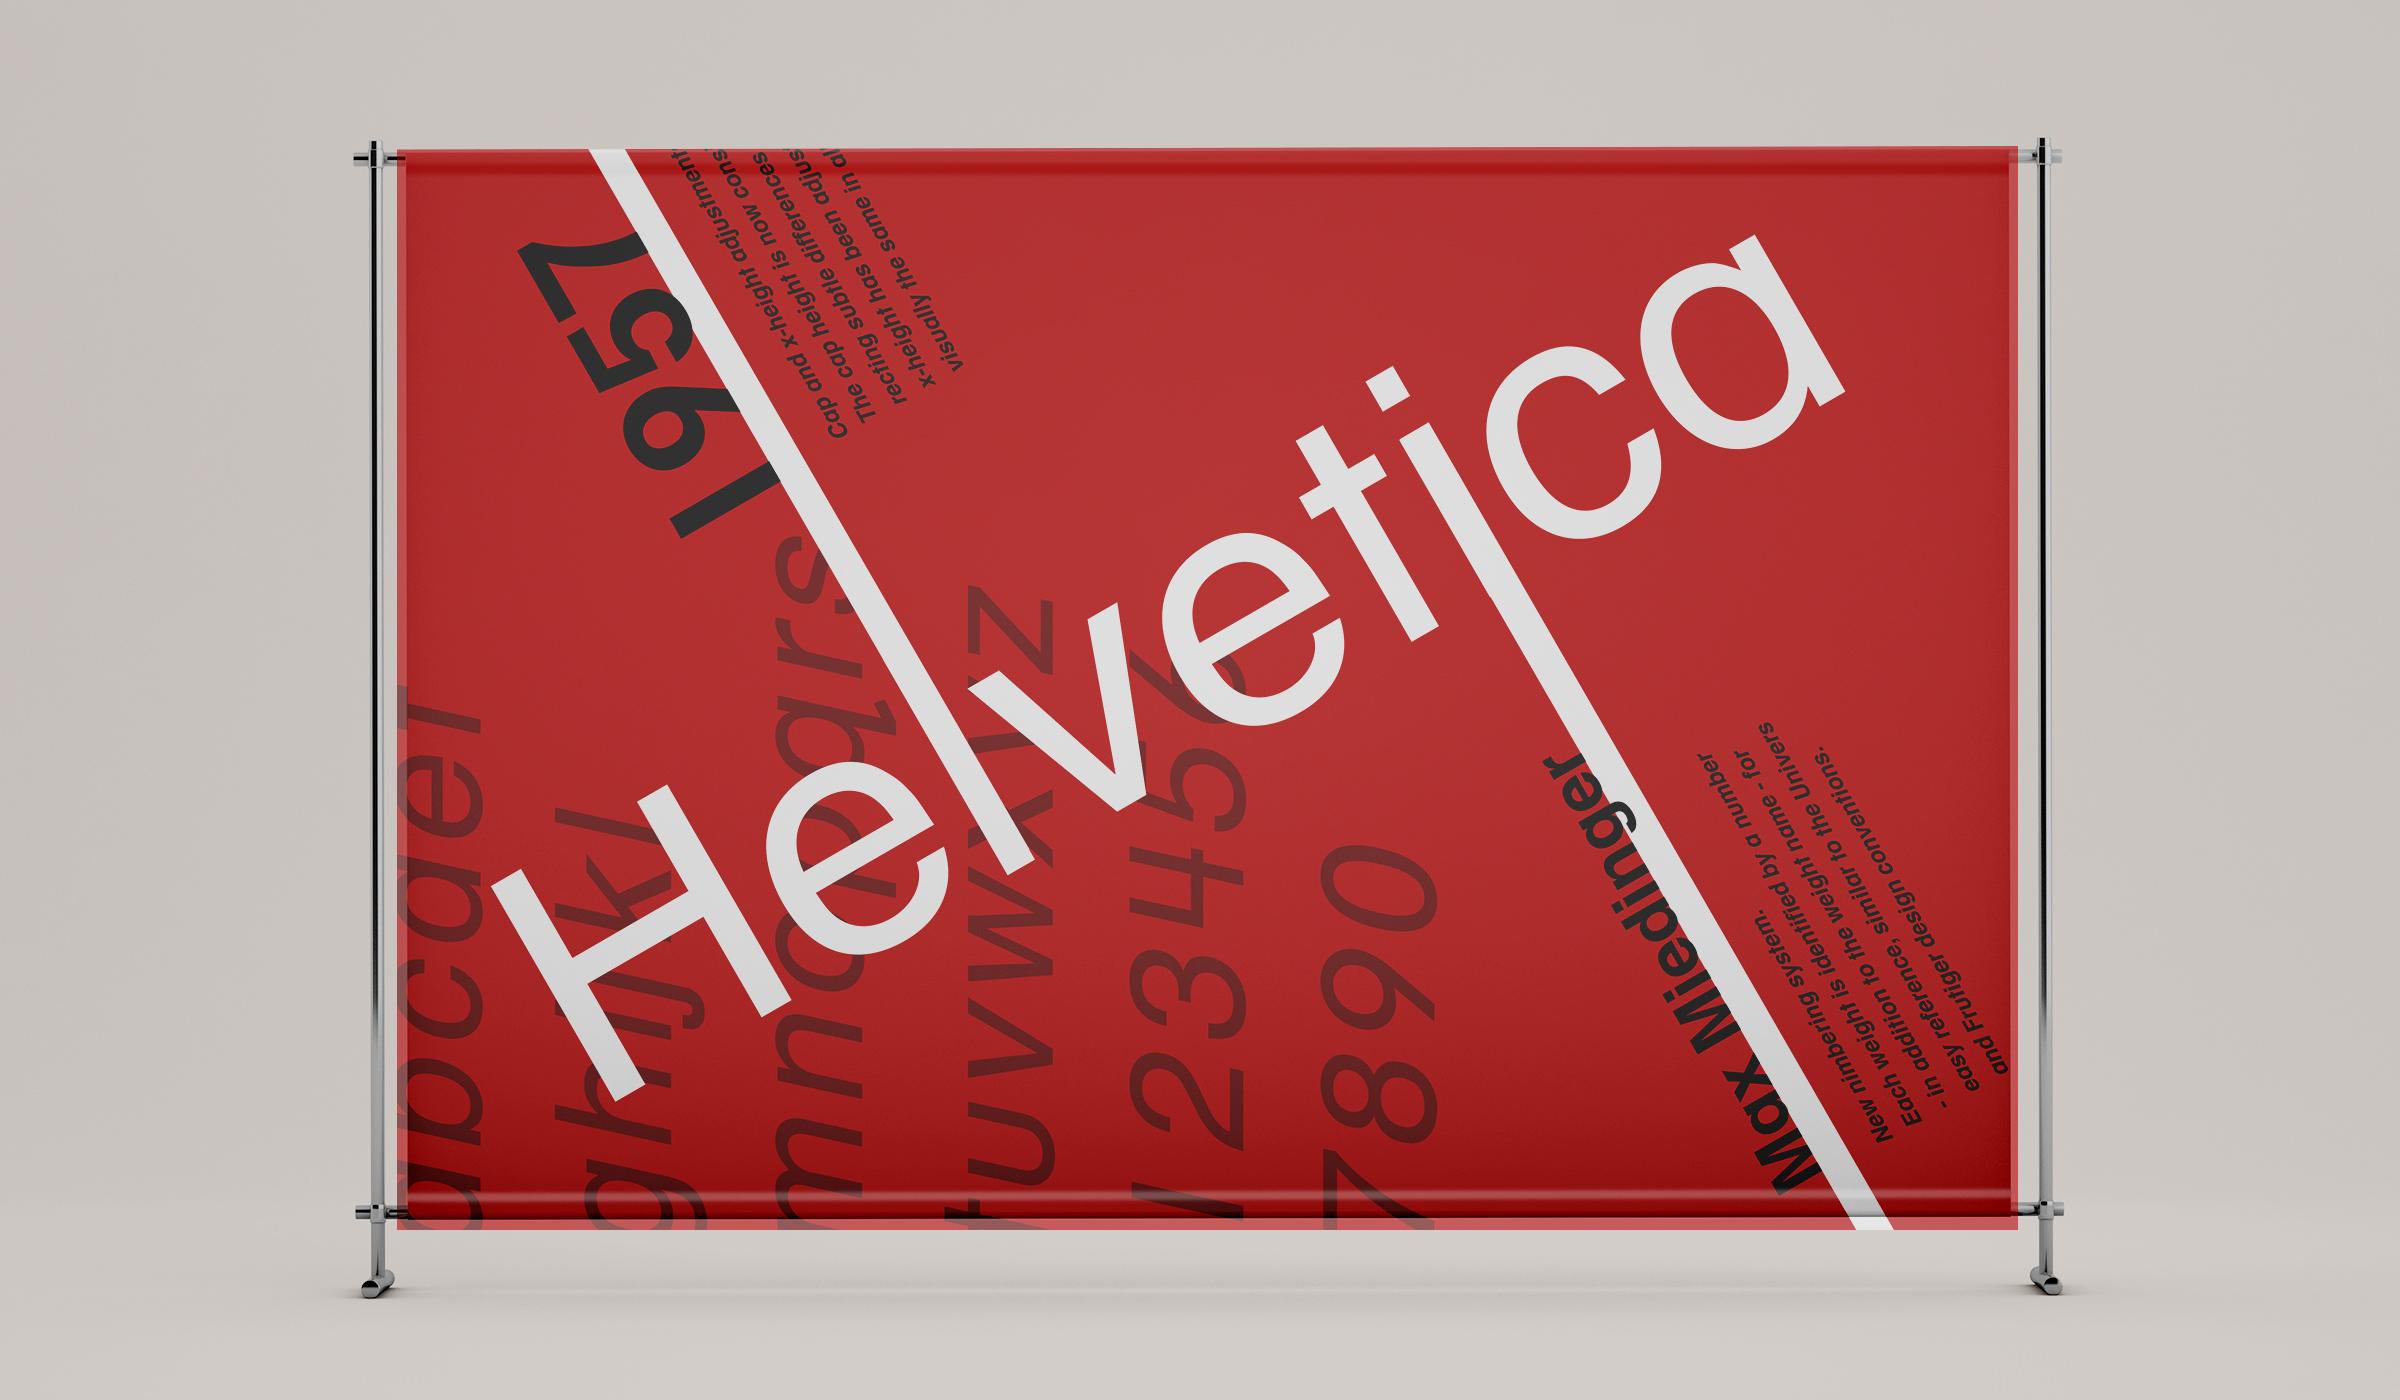 Helvetica Textbook Pro